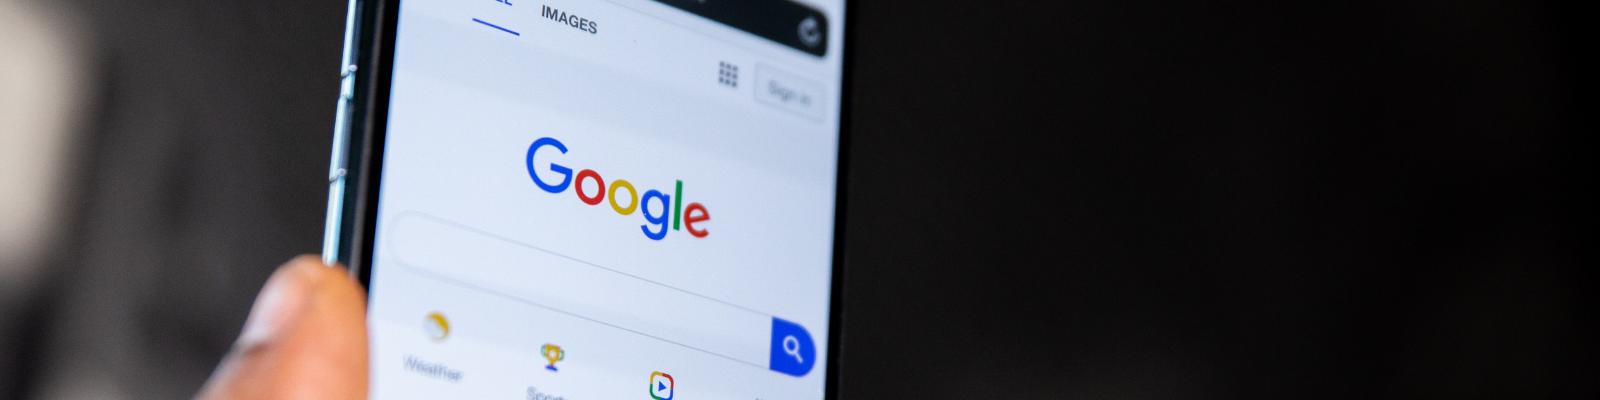 improve google rankings blog post header 5.24